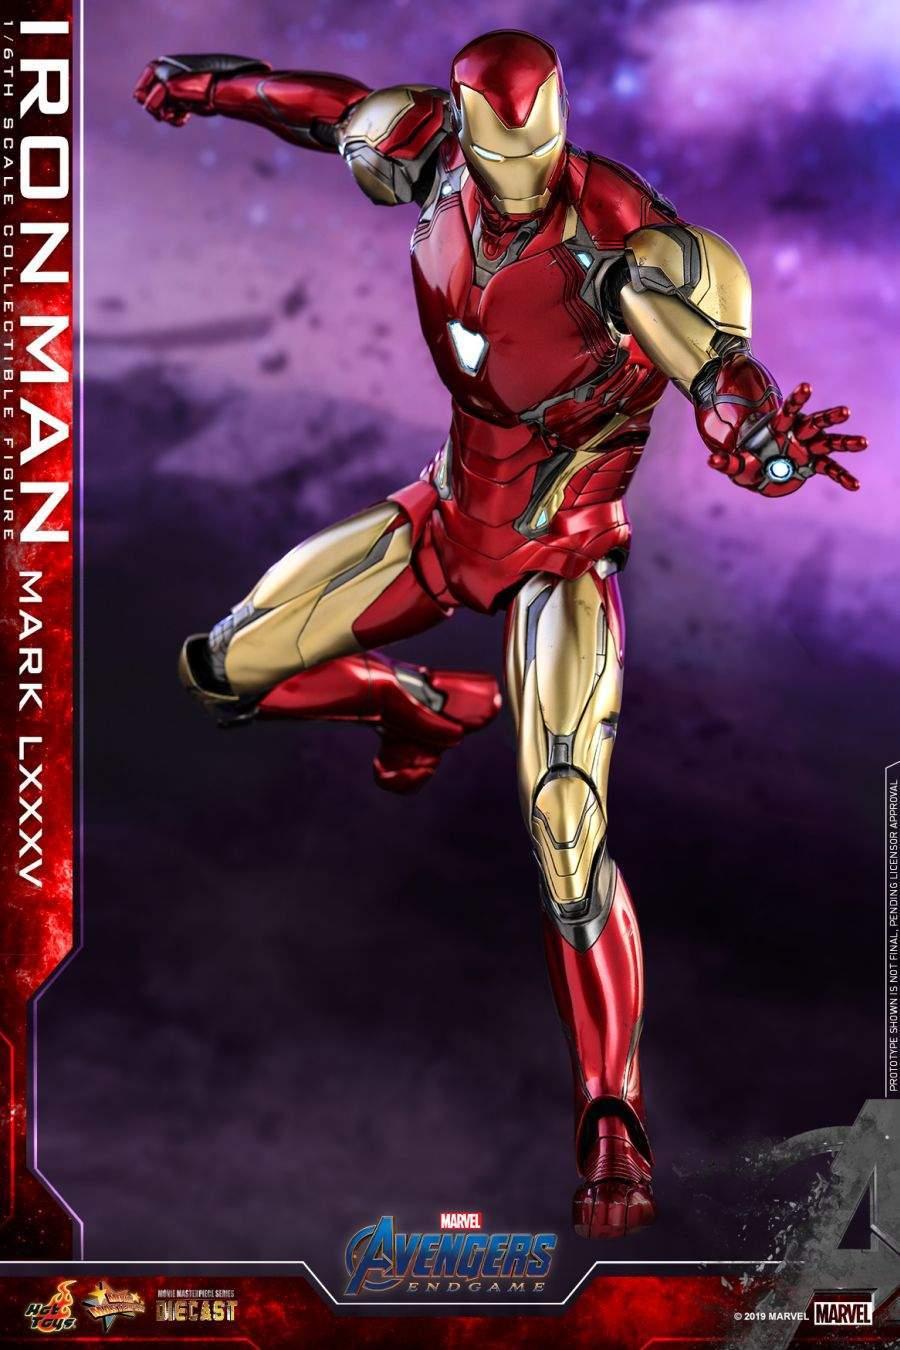 Hot Toys - Avengers 4 - Iron Man Mark LXXXV collectible figure_PR3